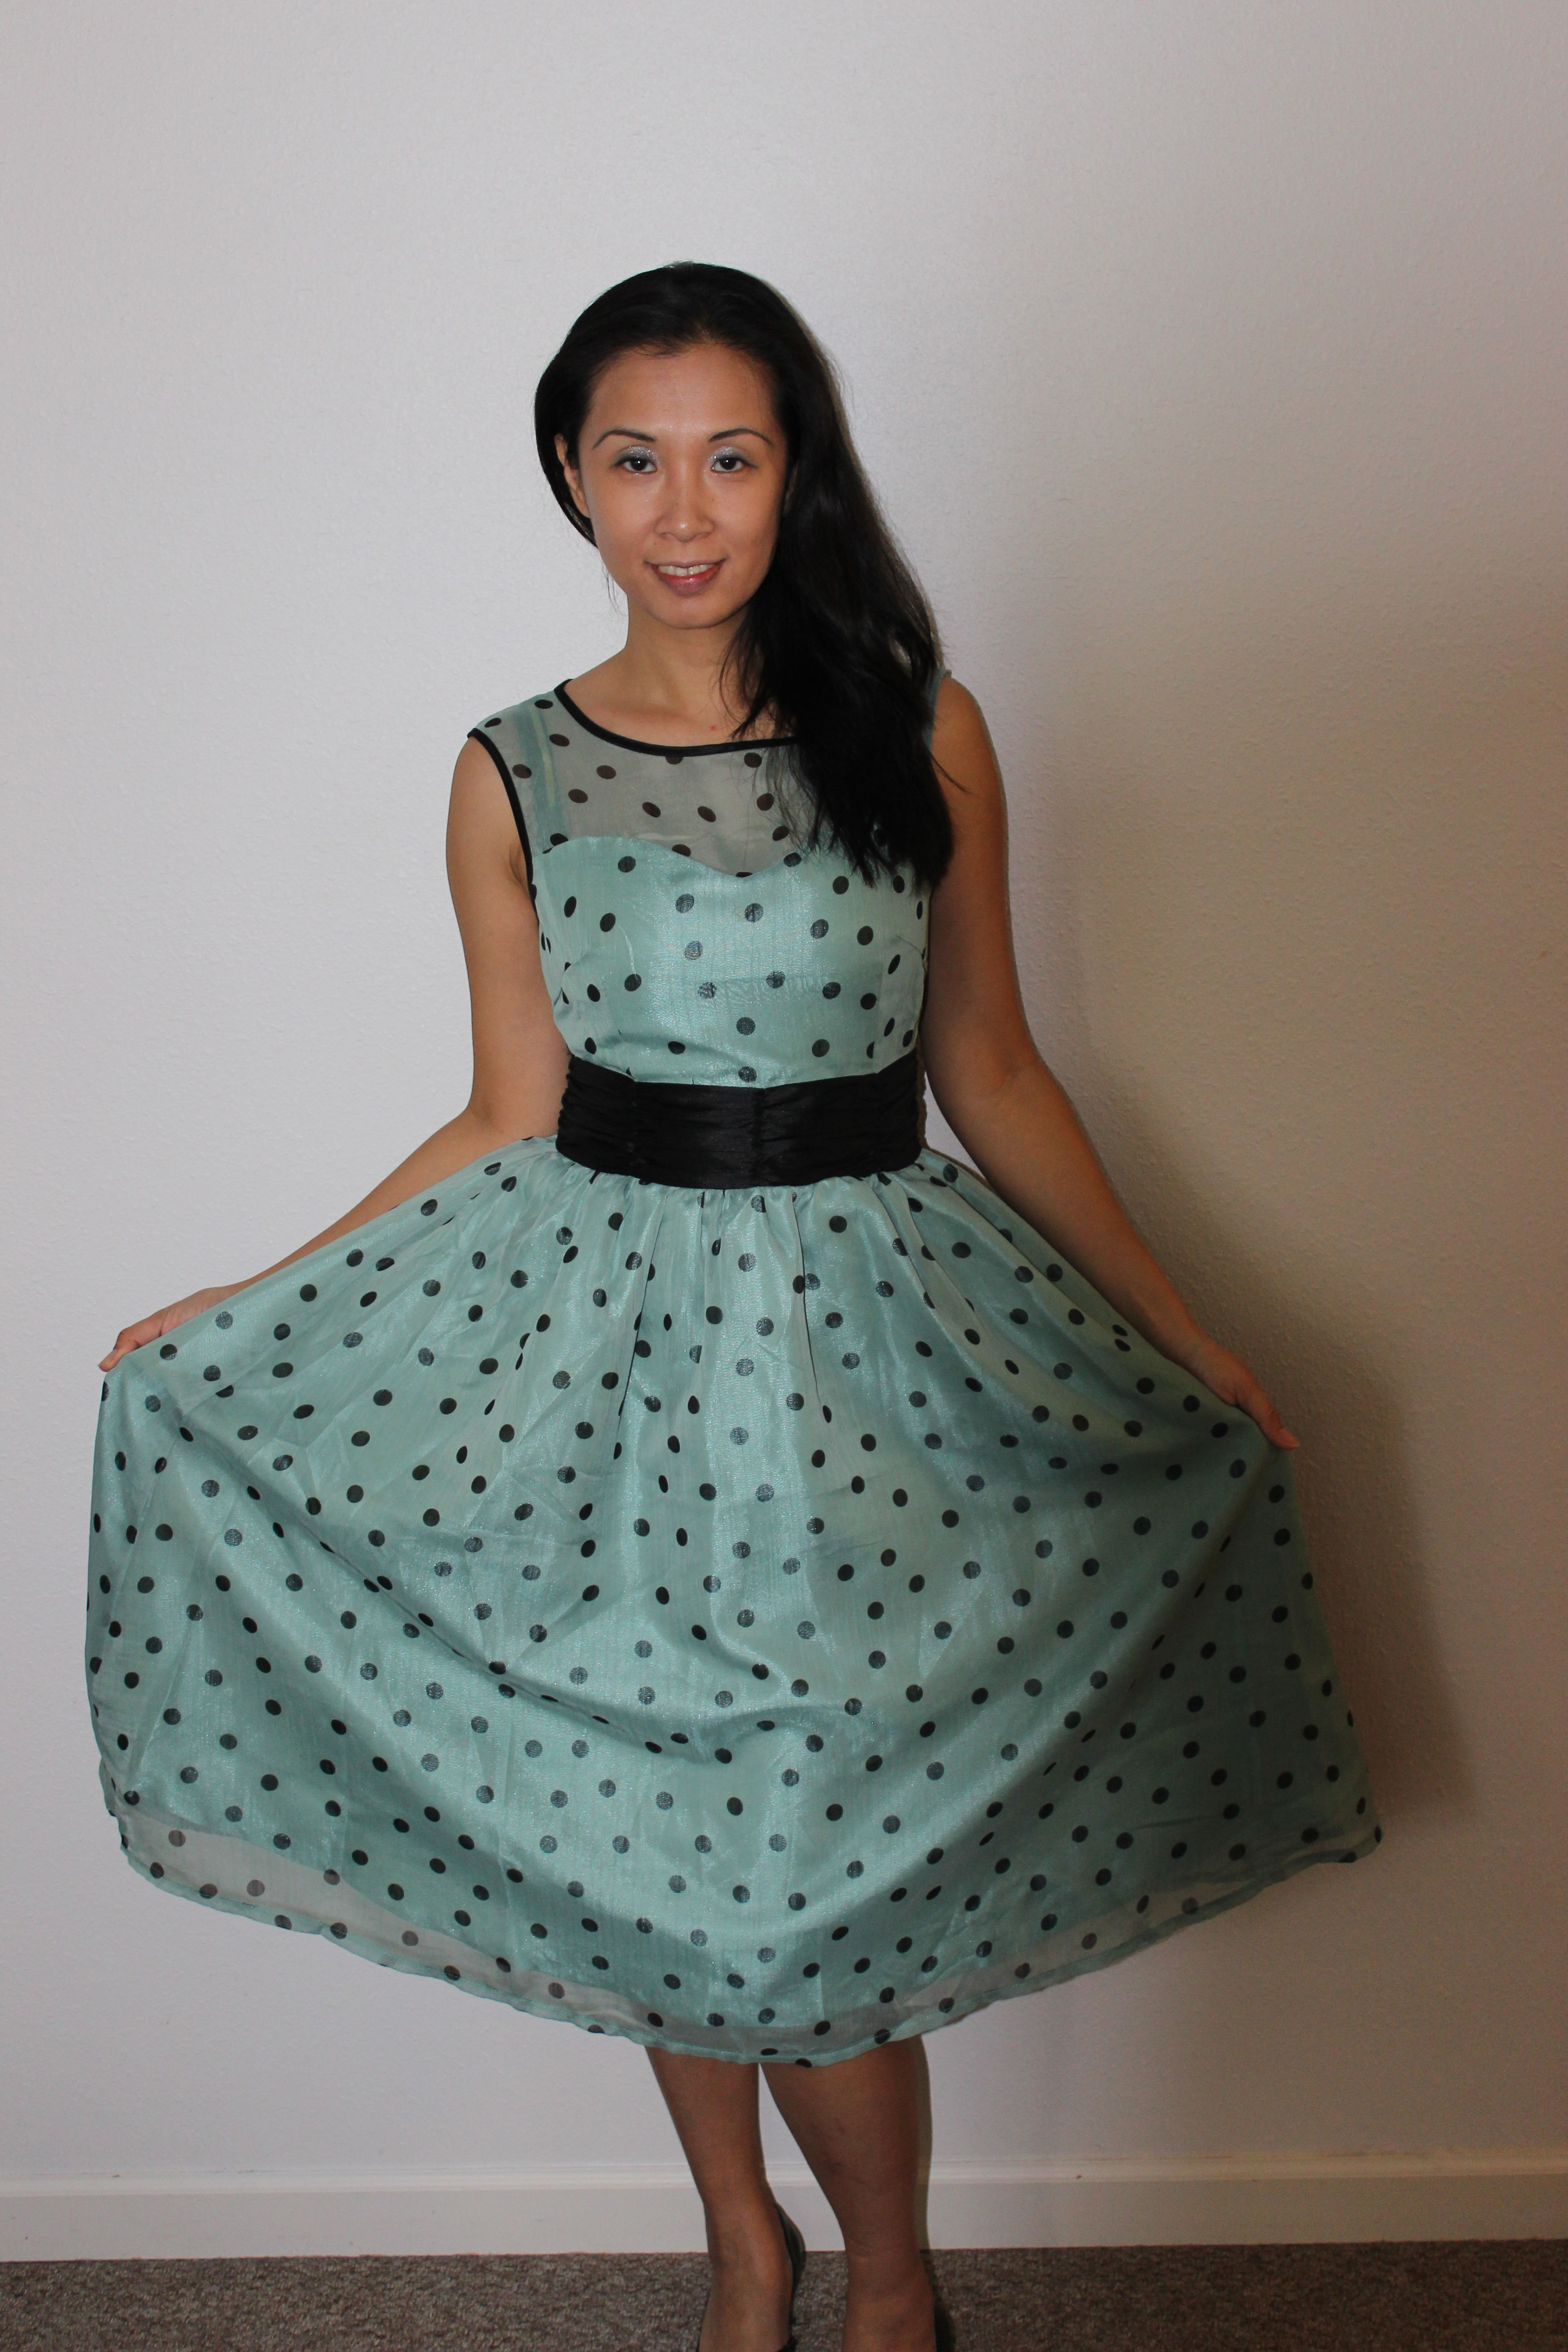 be7bb456d4d74 Lindy Bop Cindy Sage for St. Patrick's Day party and parade ! #lindybop  #greendress #polkadot #polkadotdress #ukdesign #ukbrand #1950s #50s  #retrostyle ...